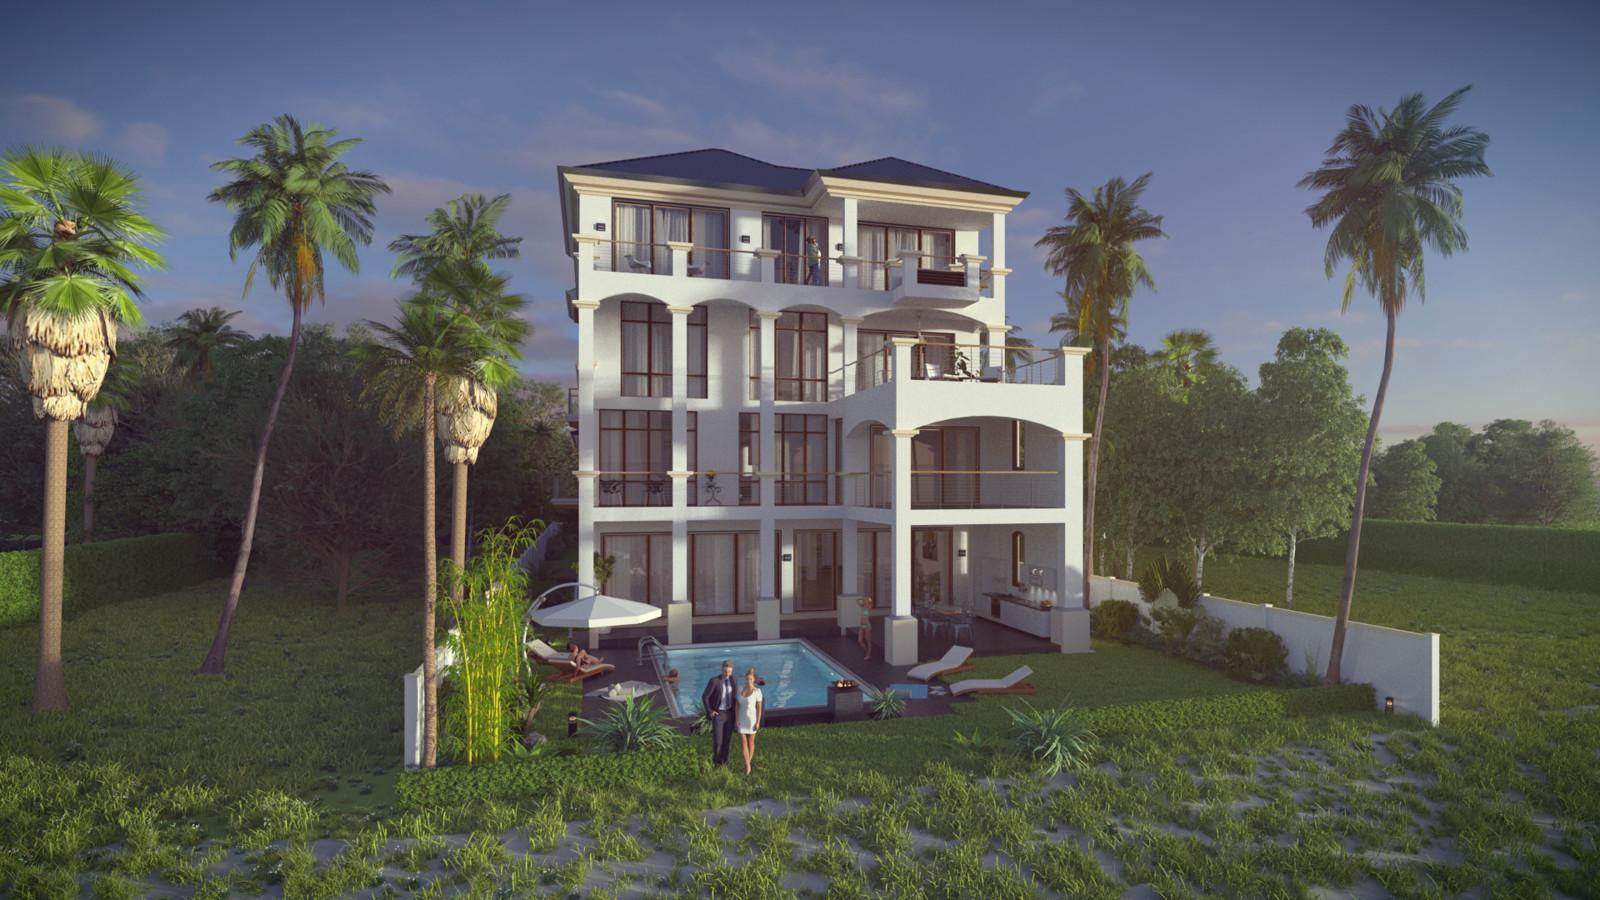 SketchUp + Thea Render  Seagrove Beach House: Scene 54 2pt Studio B Lumina Rise 1920 × 1080 Presto MC Bucket